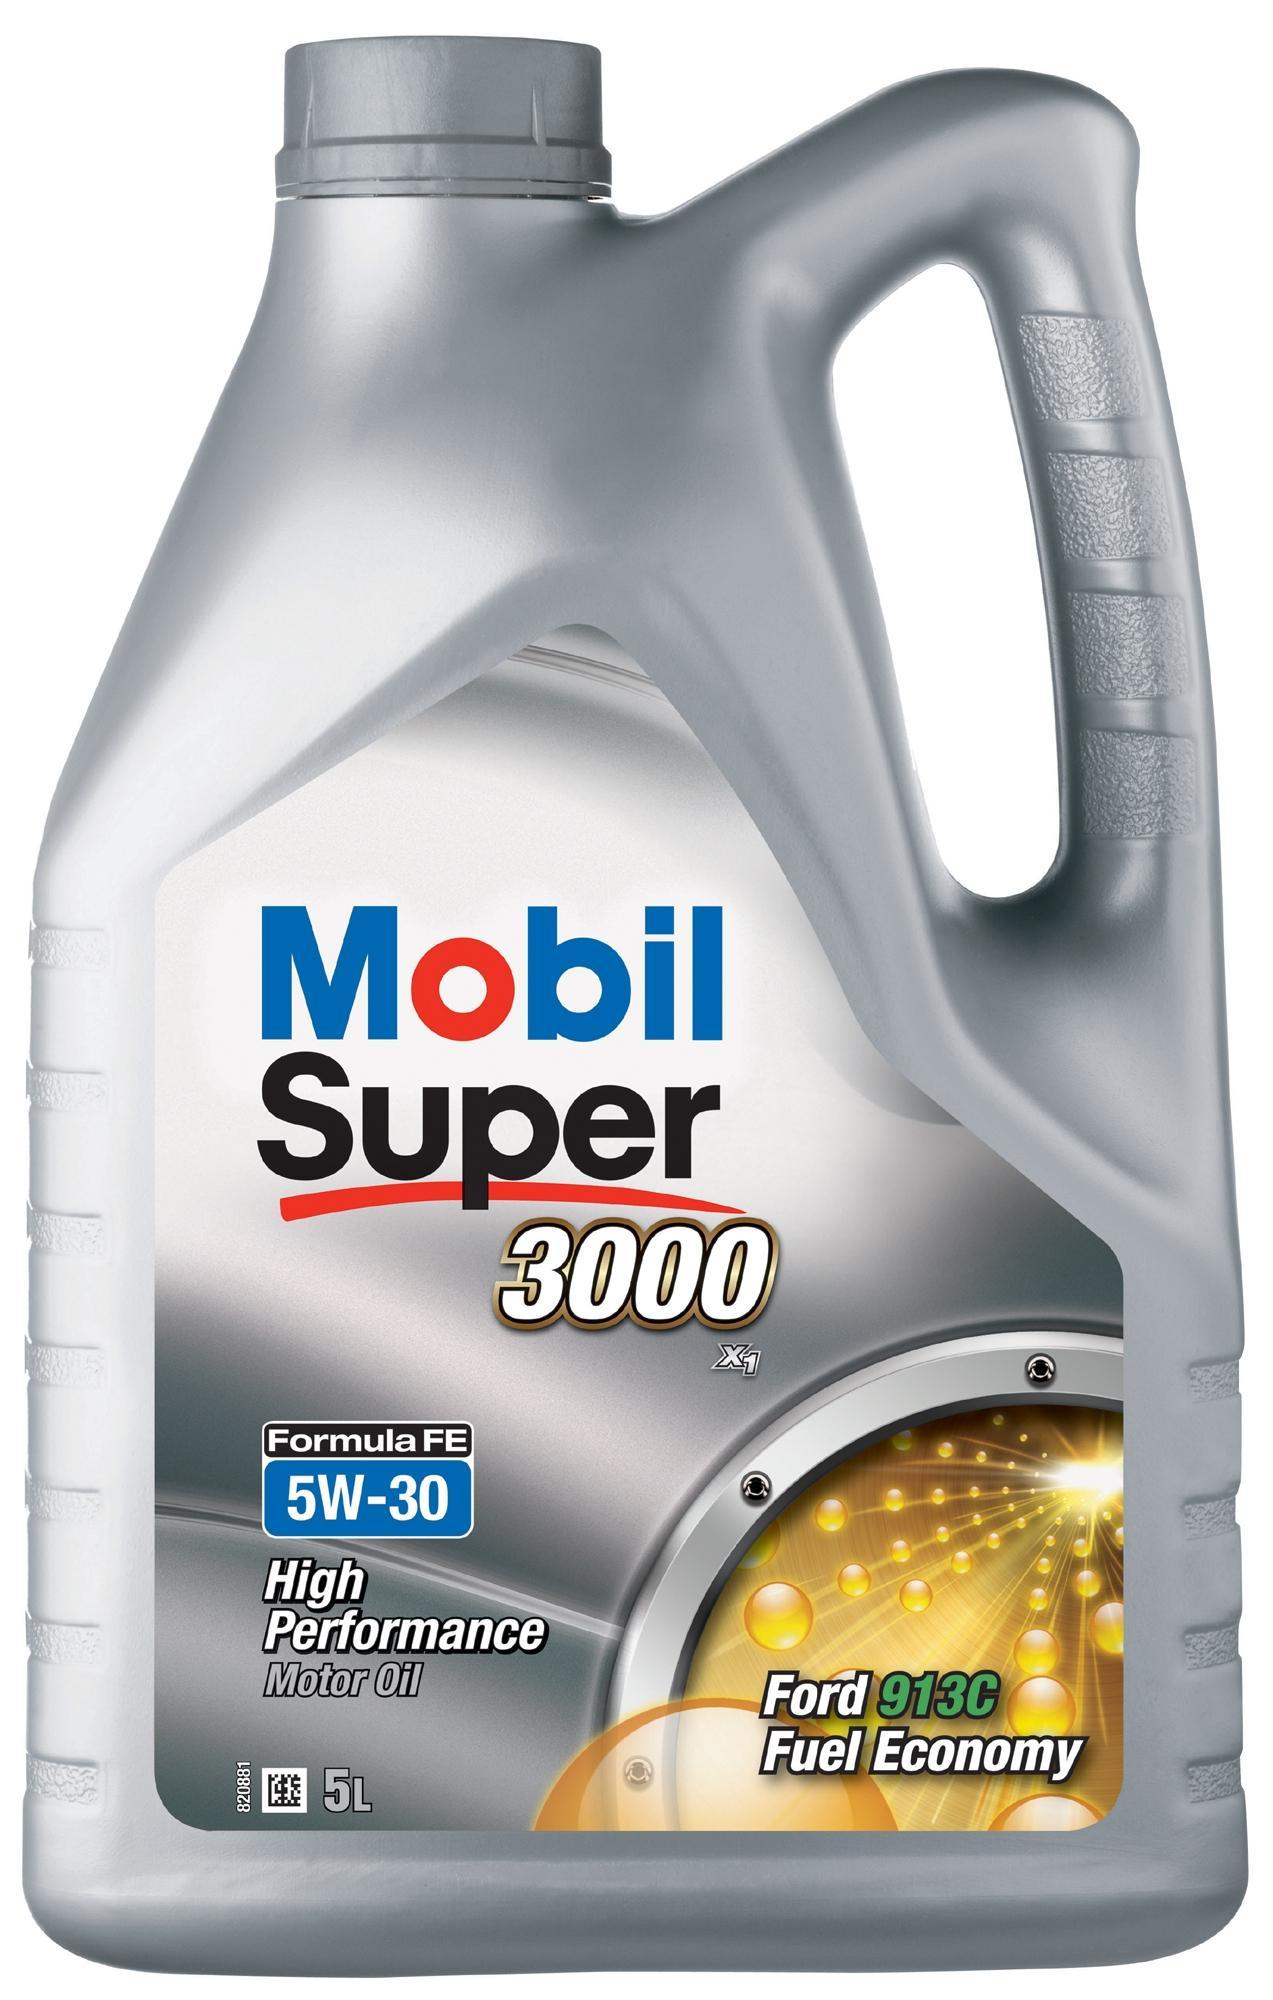 mobil super 3000 x1 formula fe sae 5w 30 motor oil 5